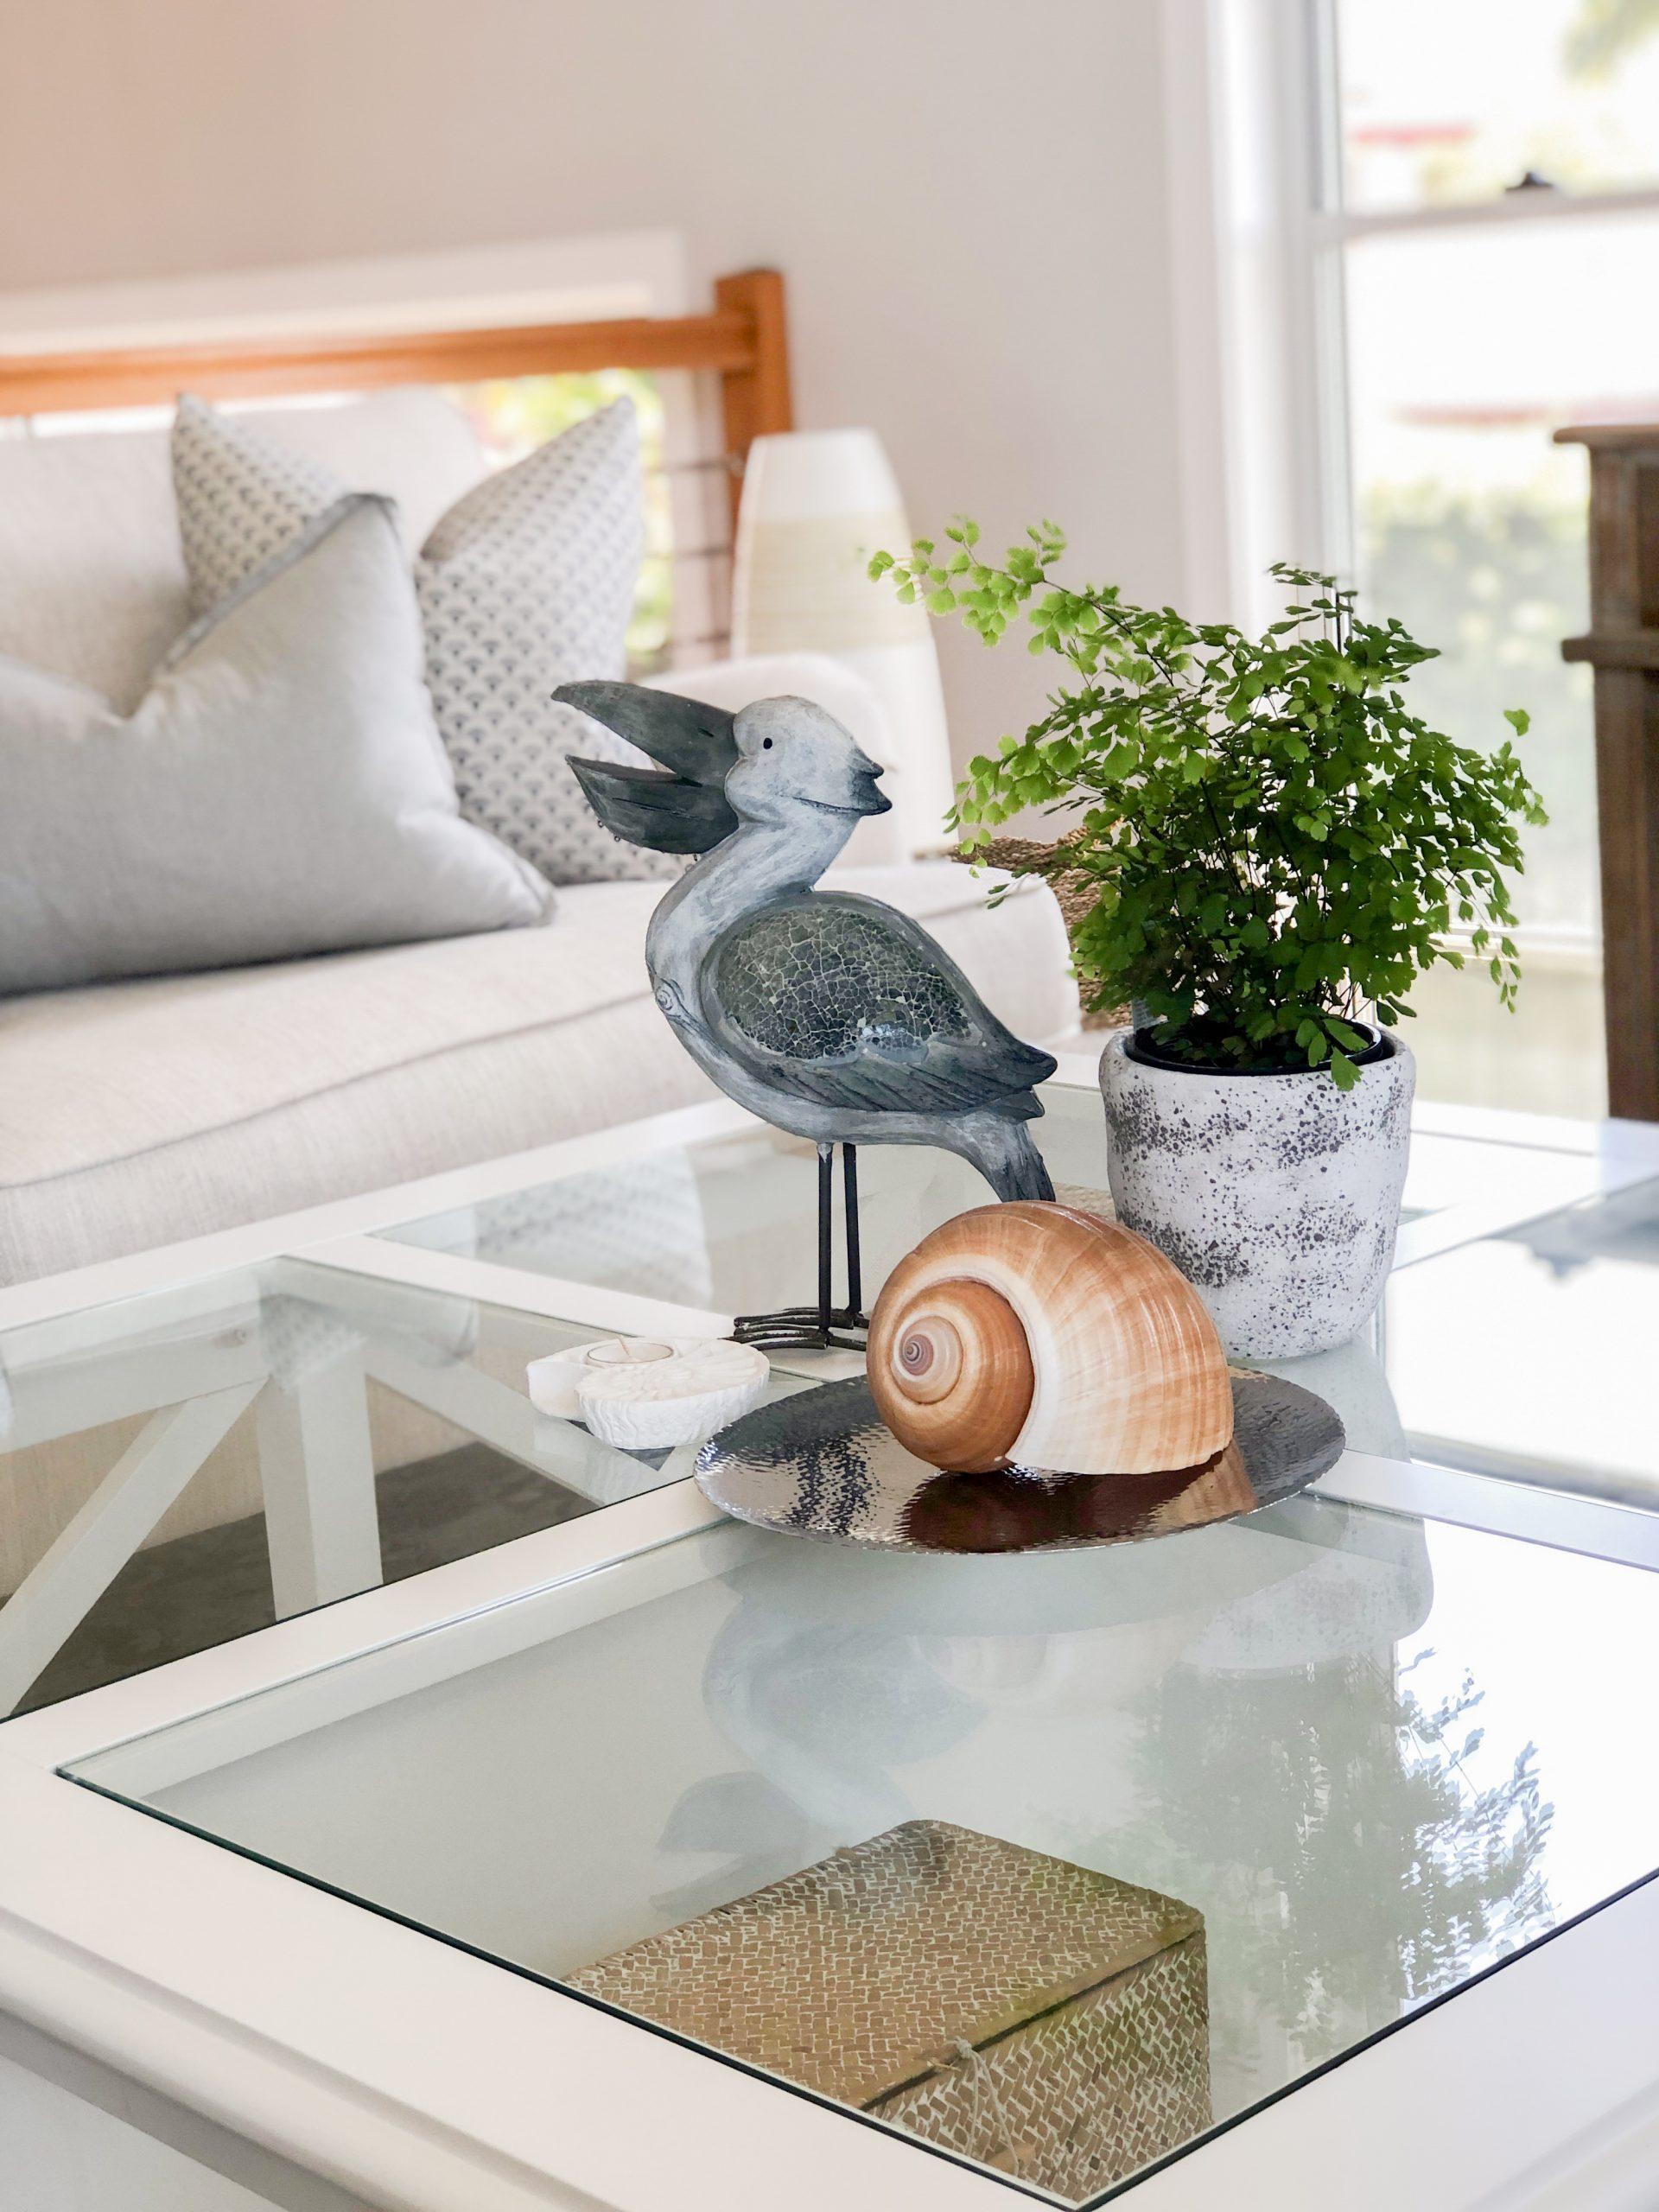 https://www.ivyandfinch.com.au/wp-content/uploads/2021/02/Redland-Bay-Interior-Design-Hampton-Interiors-scaled.jpg